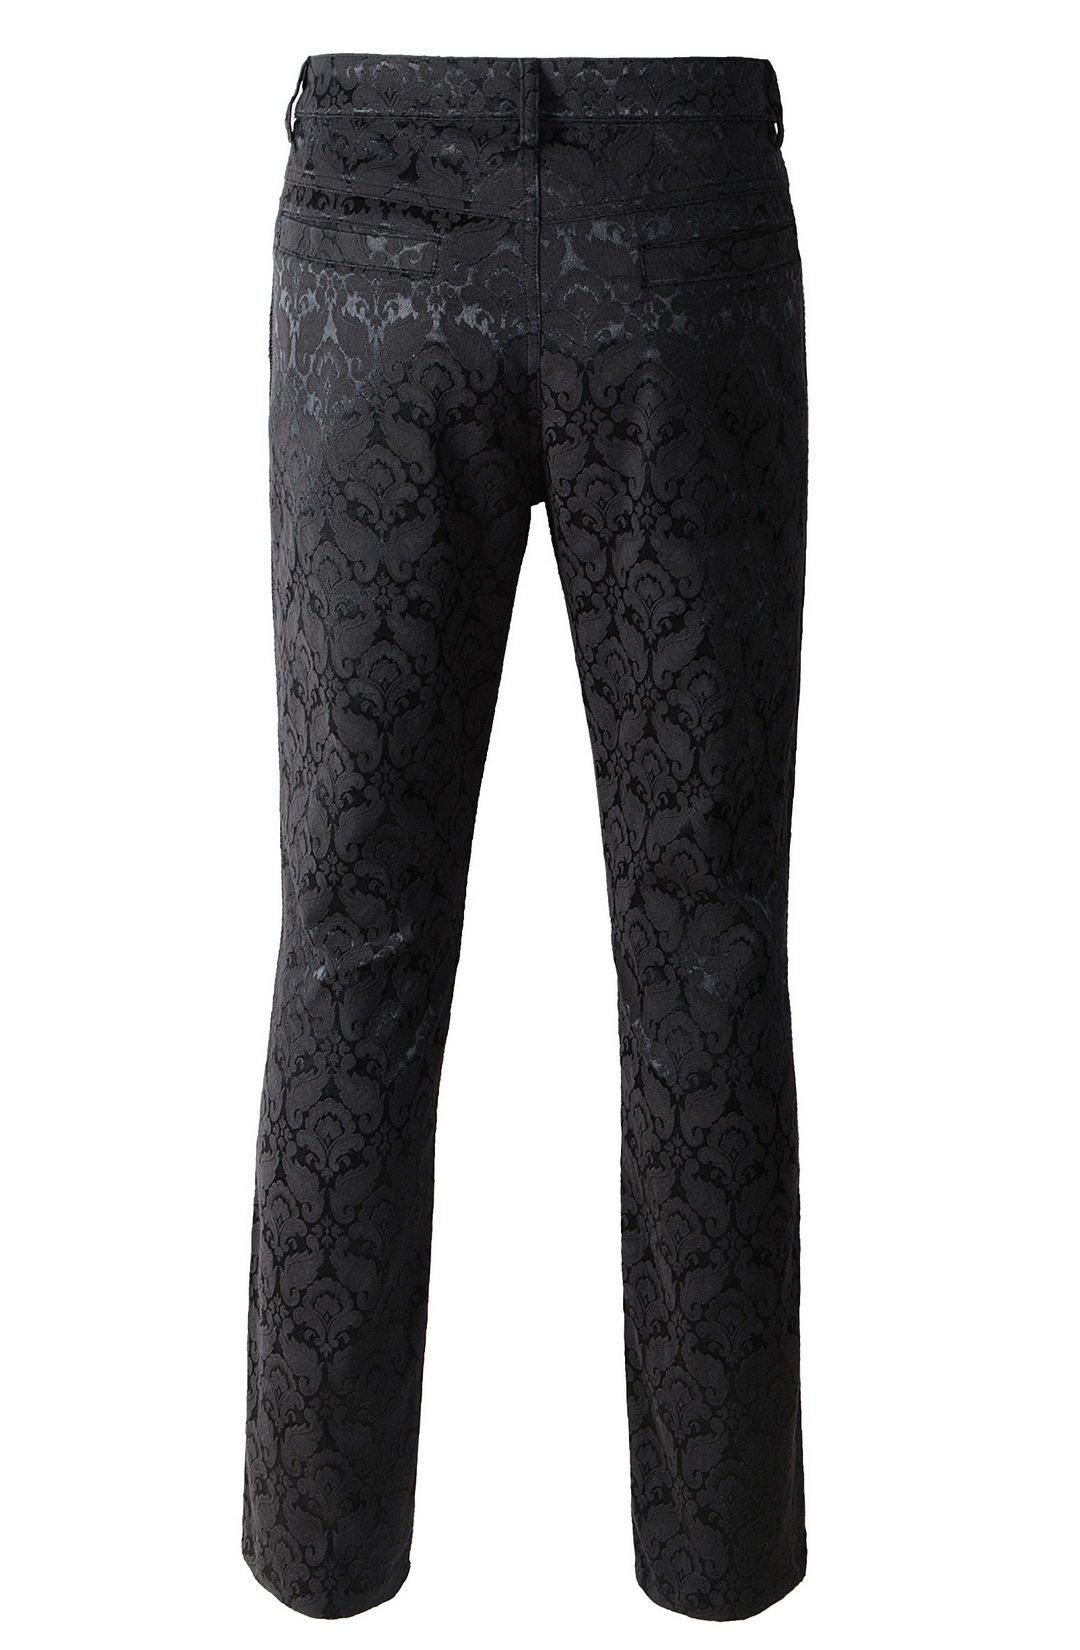 DarcChic Mens Trousers Pants Brocade VTG Gothic Aristocrat Steampunk Side Braiding Trim 5